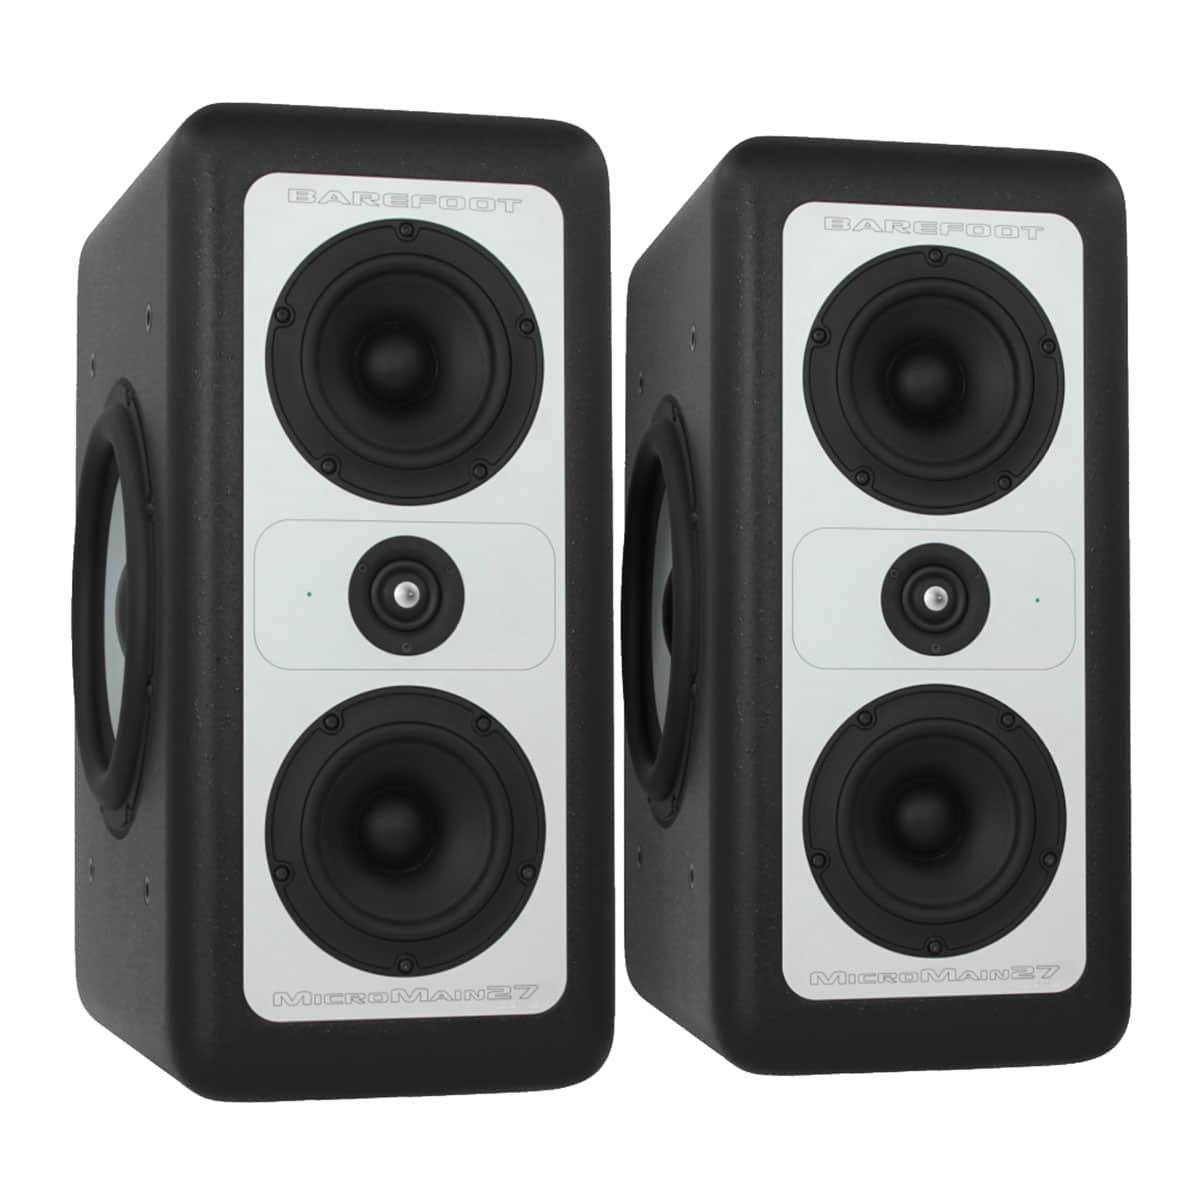 Barefoot Sound MicroMain 27 Gen2 Pro Audio, Audio Monitors, Studio Monitor Barefoot Sound Micromain 27 Gen2 1